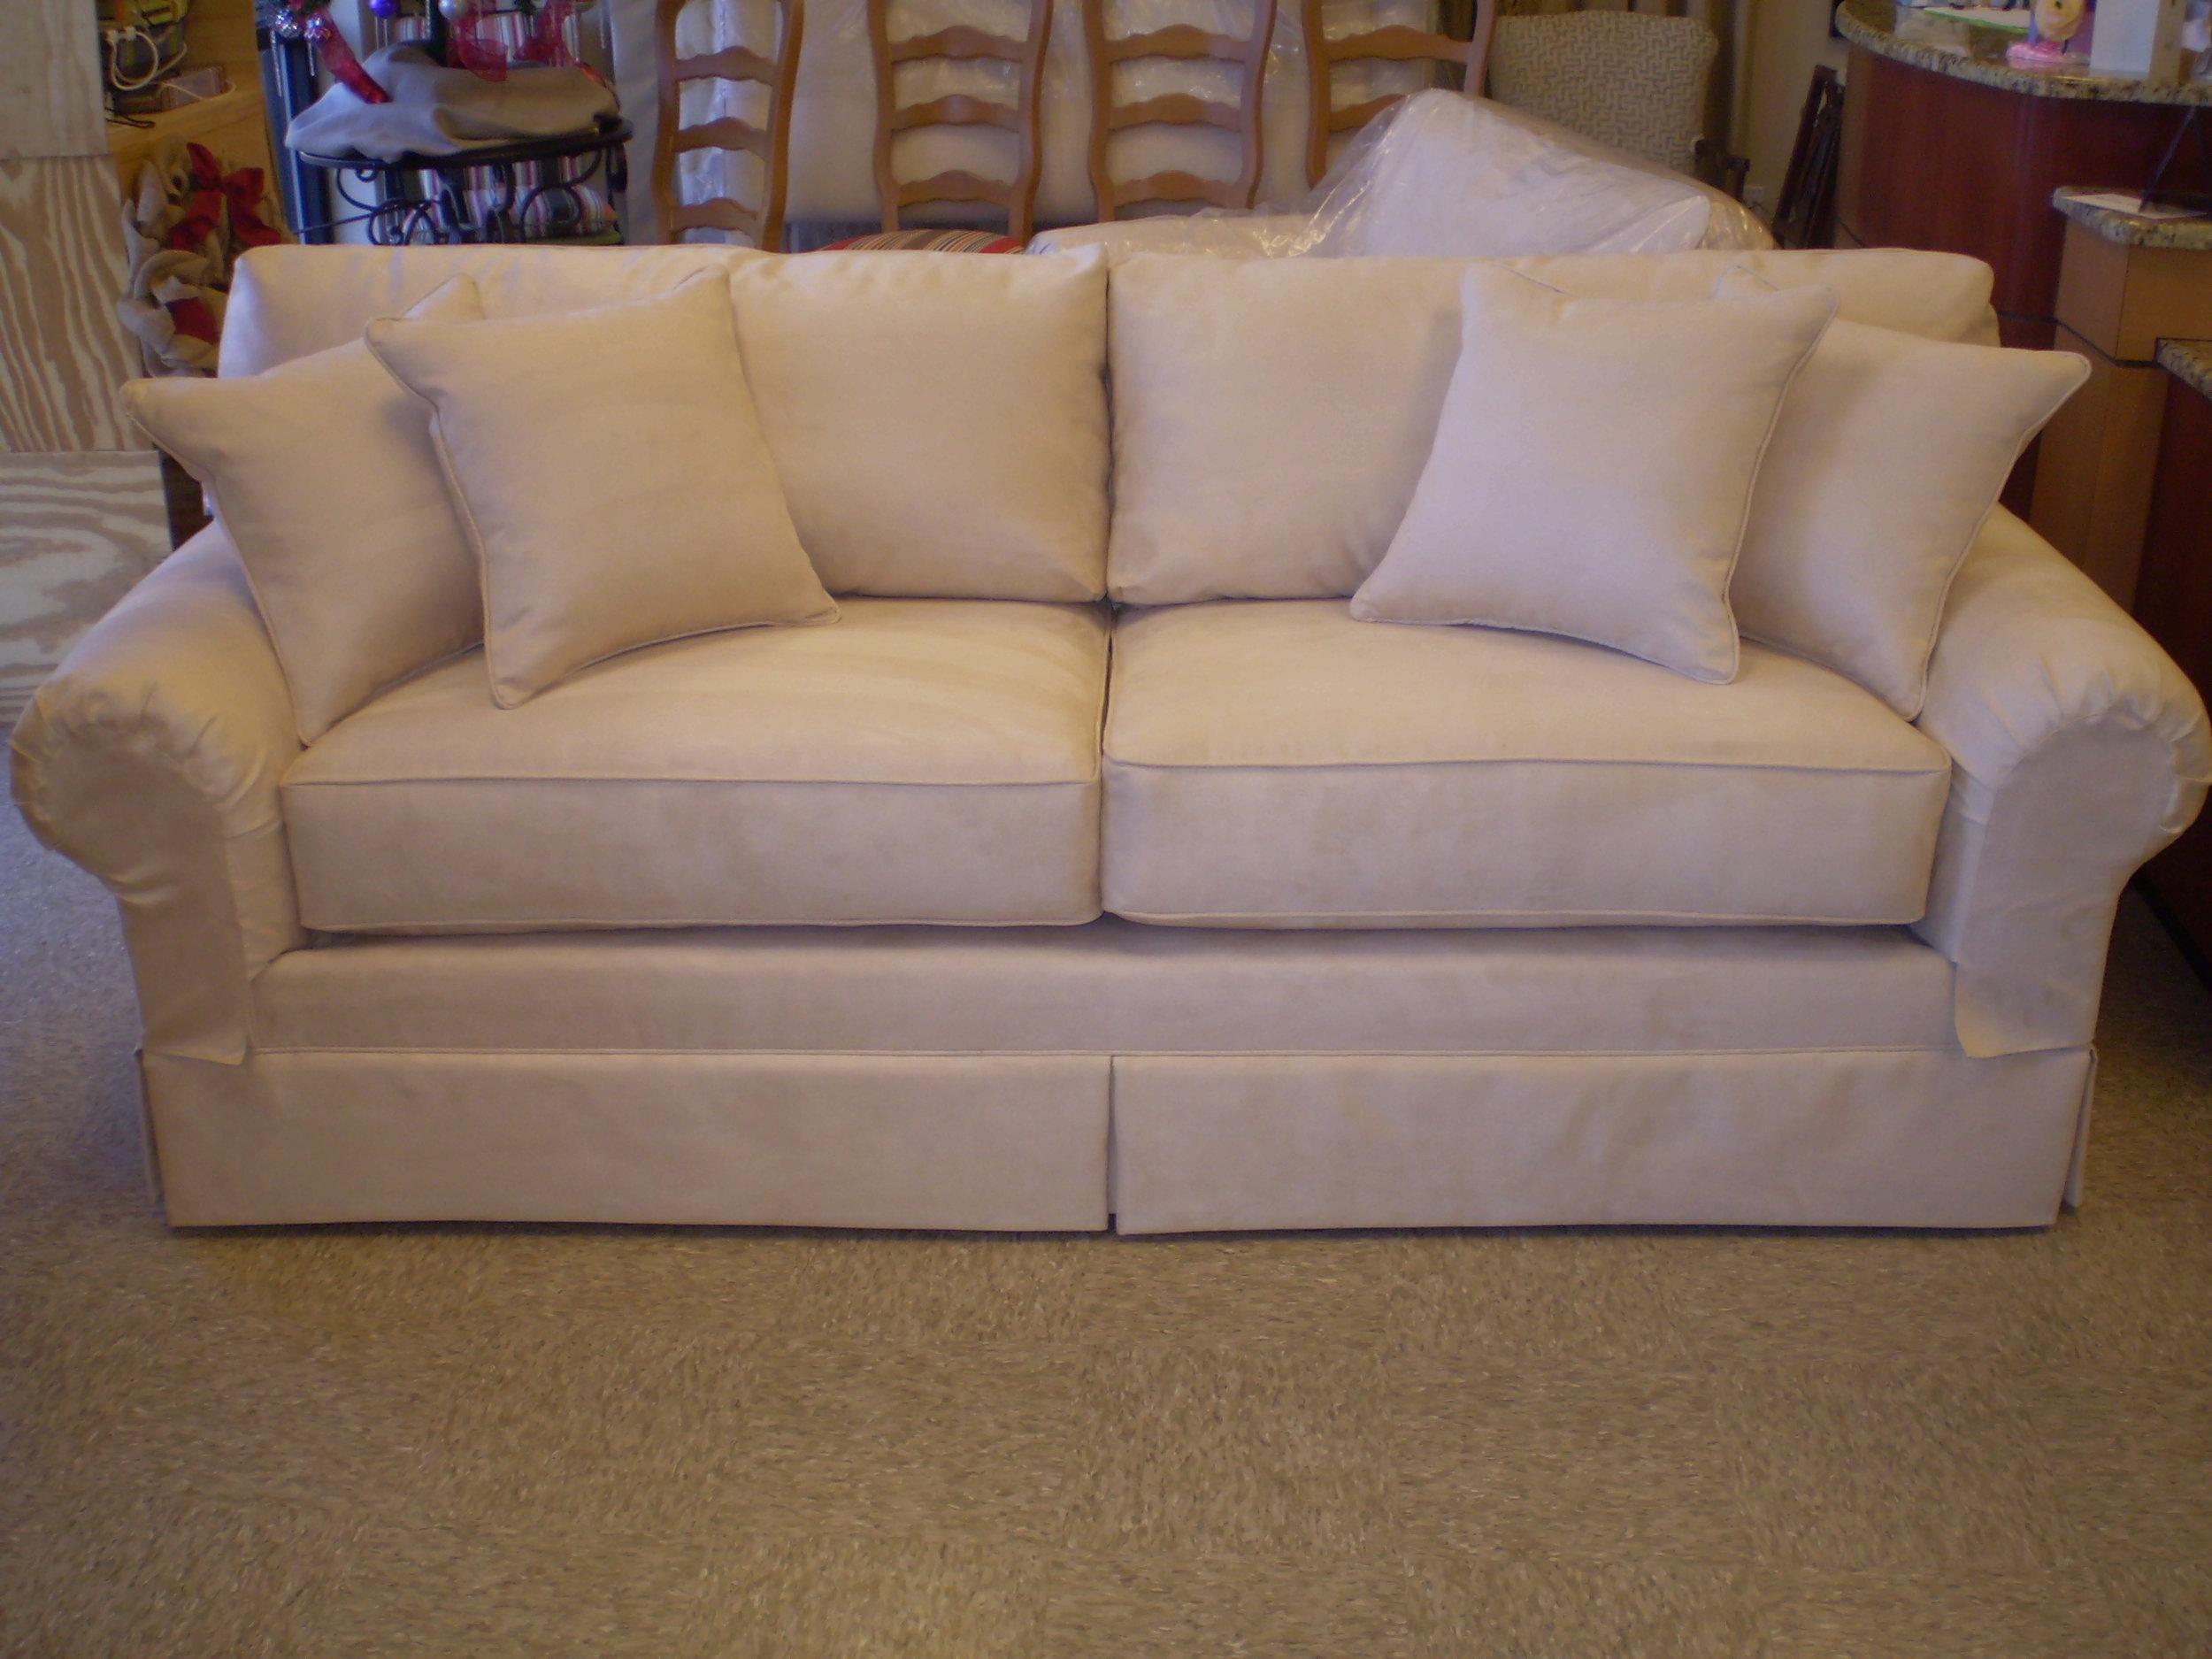 custom-furniture-upholstery-design-atlanta-georgia-4.JPG